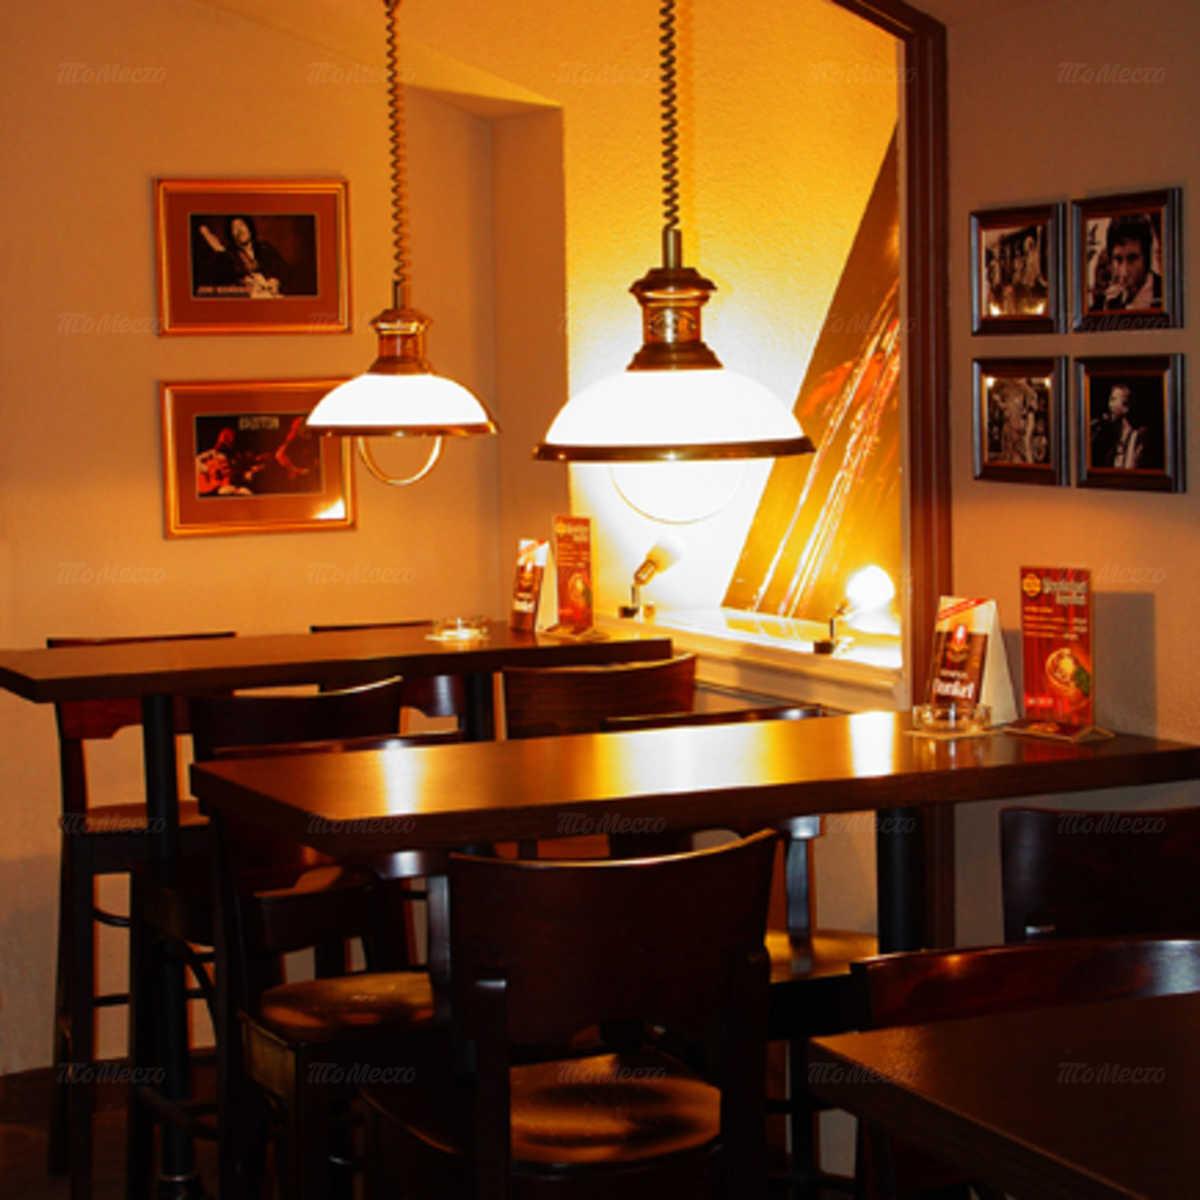 Паб Рок паб (Rock Pub) на Невском проспекте фото 4